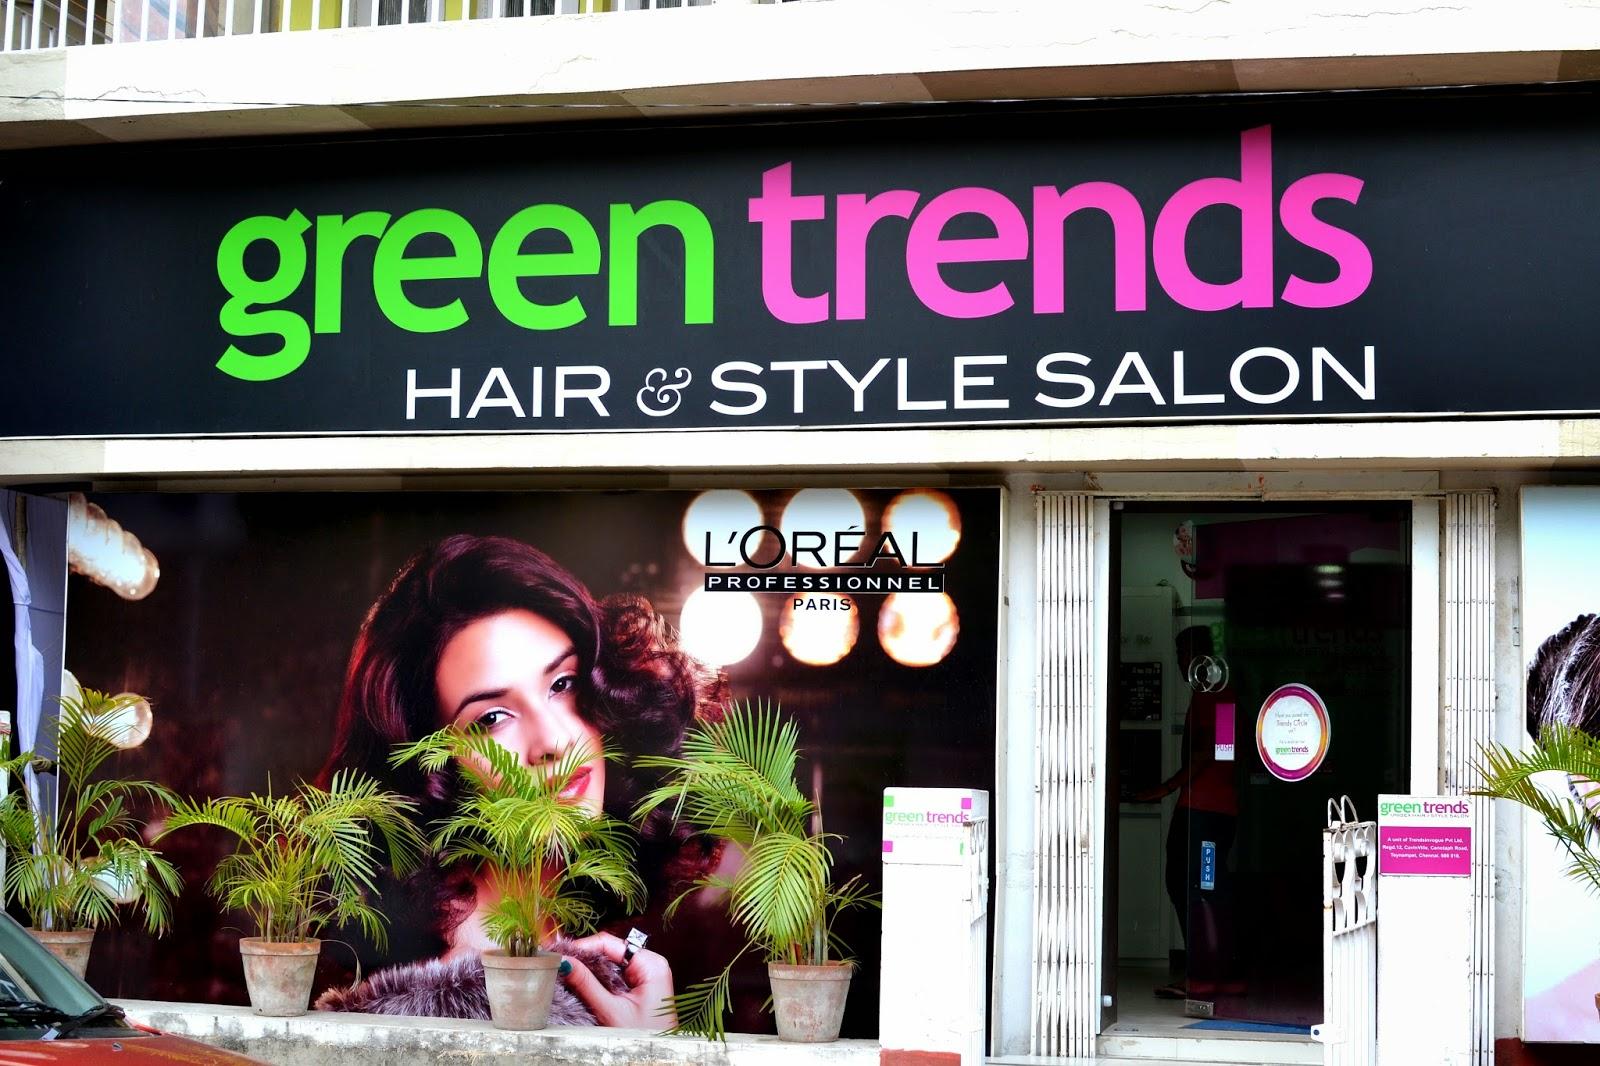 N Style Hair Salon: Summer Glow Facial At Green Trends Hair & Style Salon